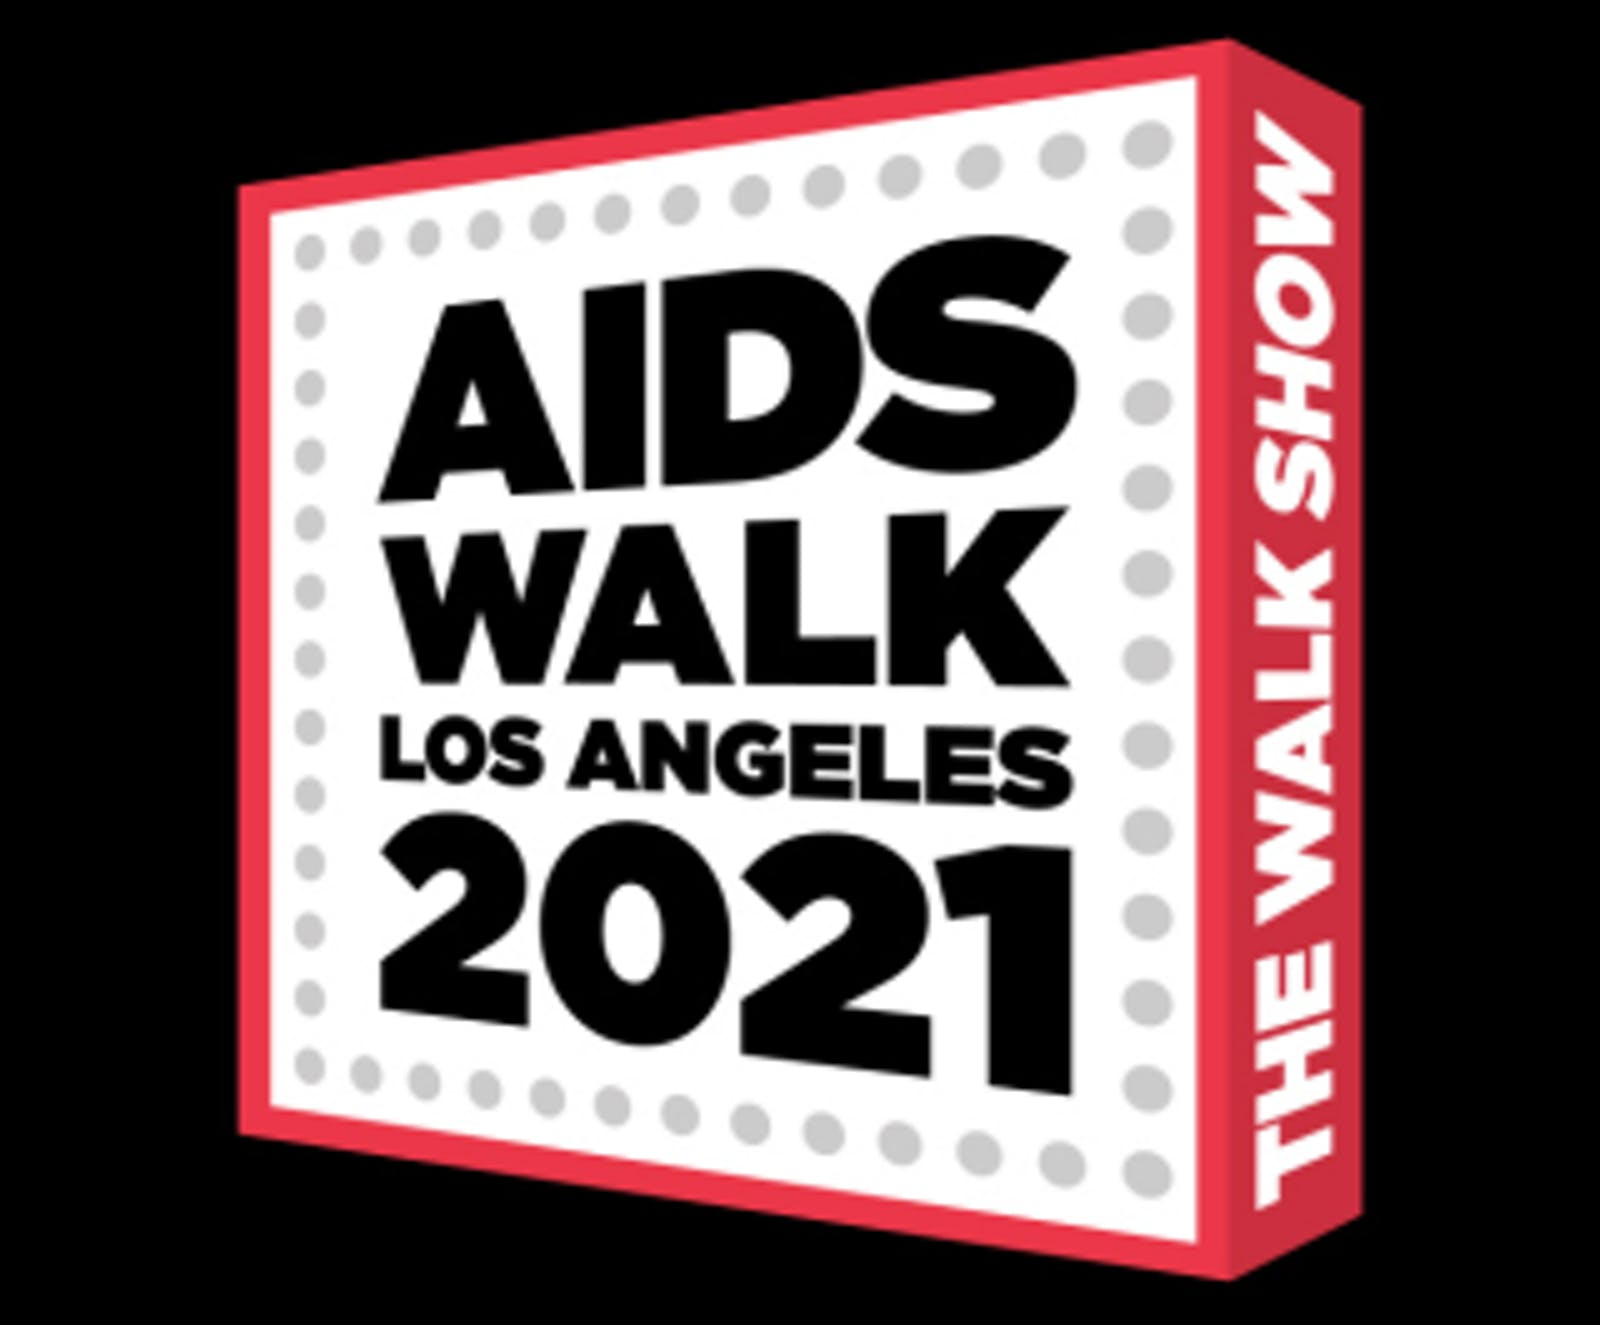 AIDS WALK 2021!!! OCT 3 DEADLINE!